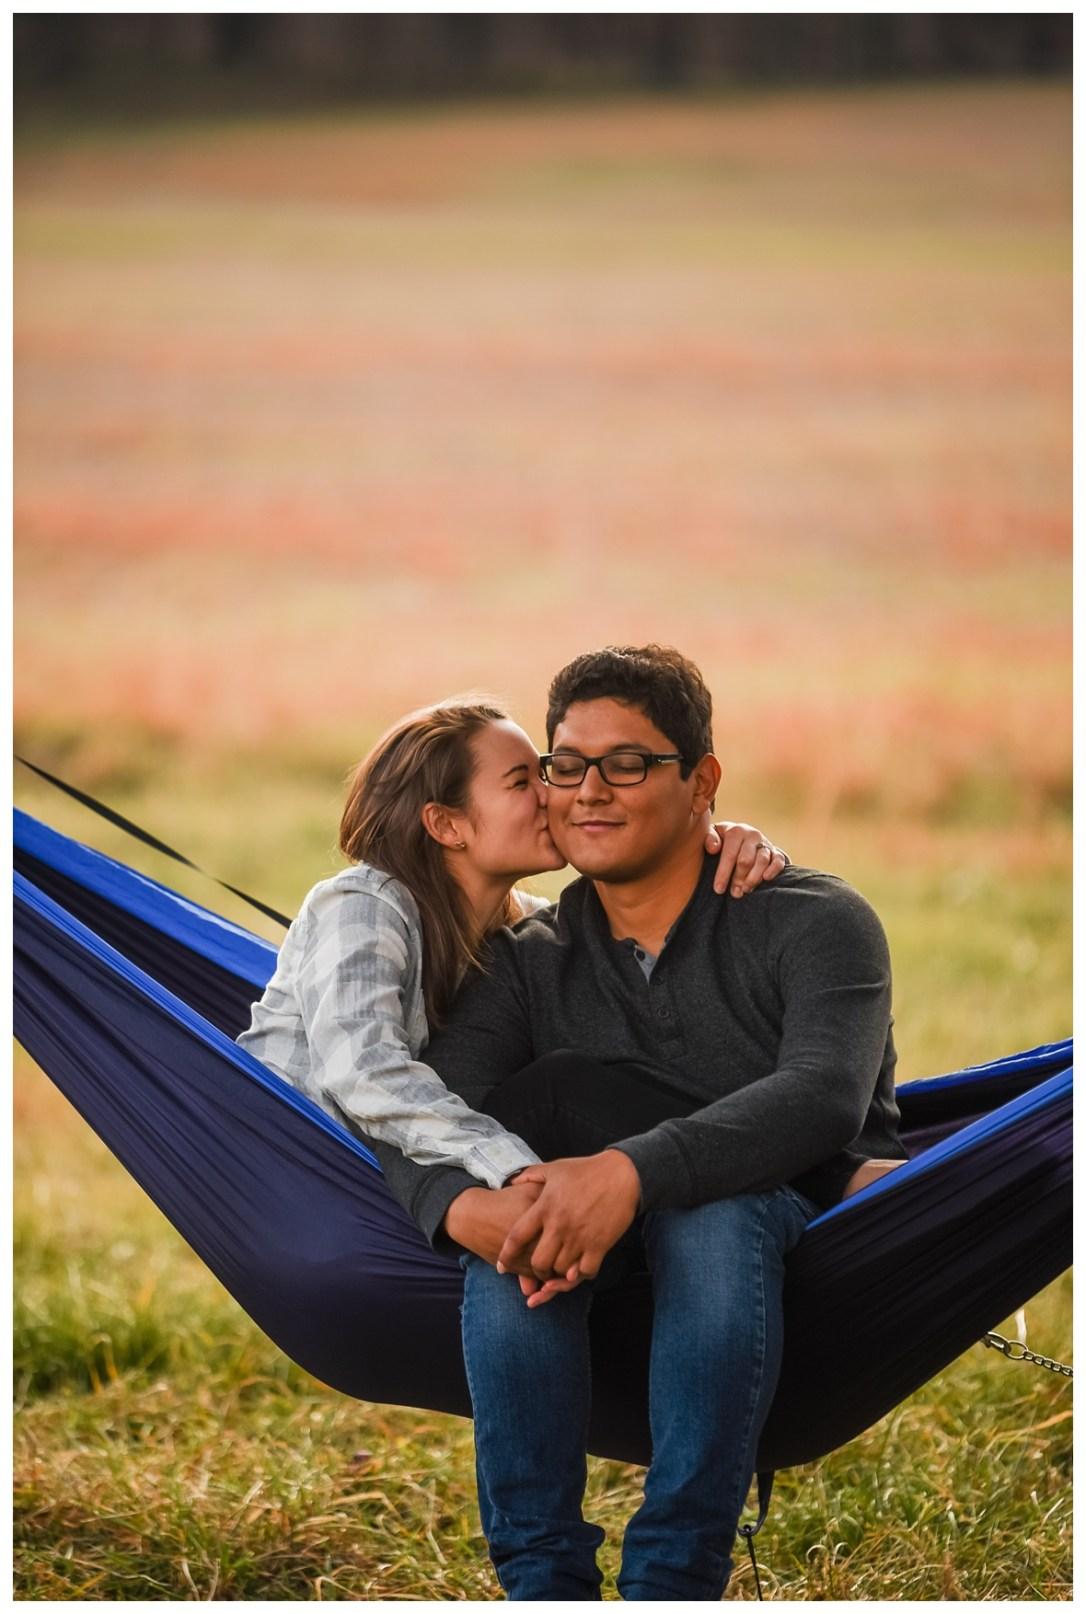 Couple snuggling in eno hammock